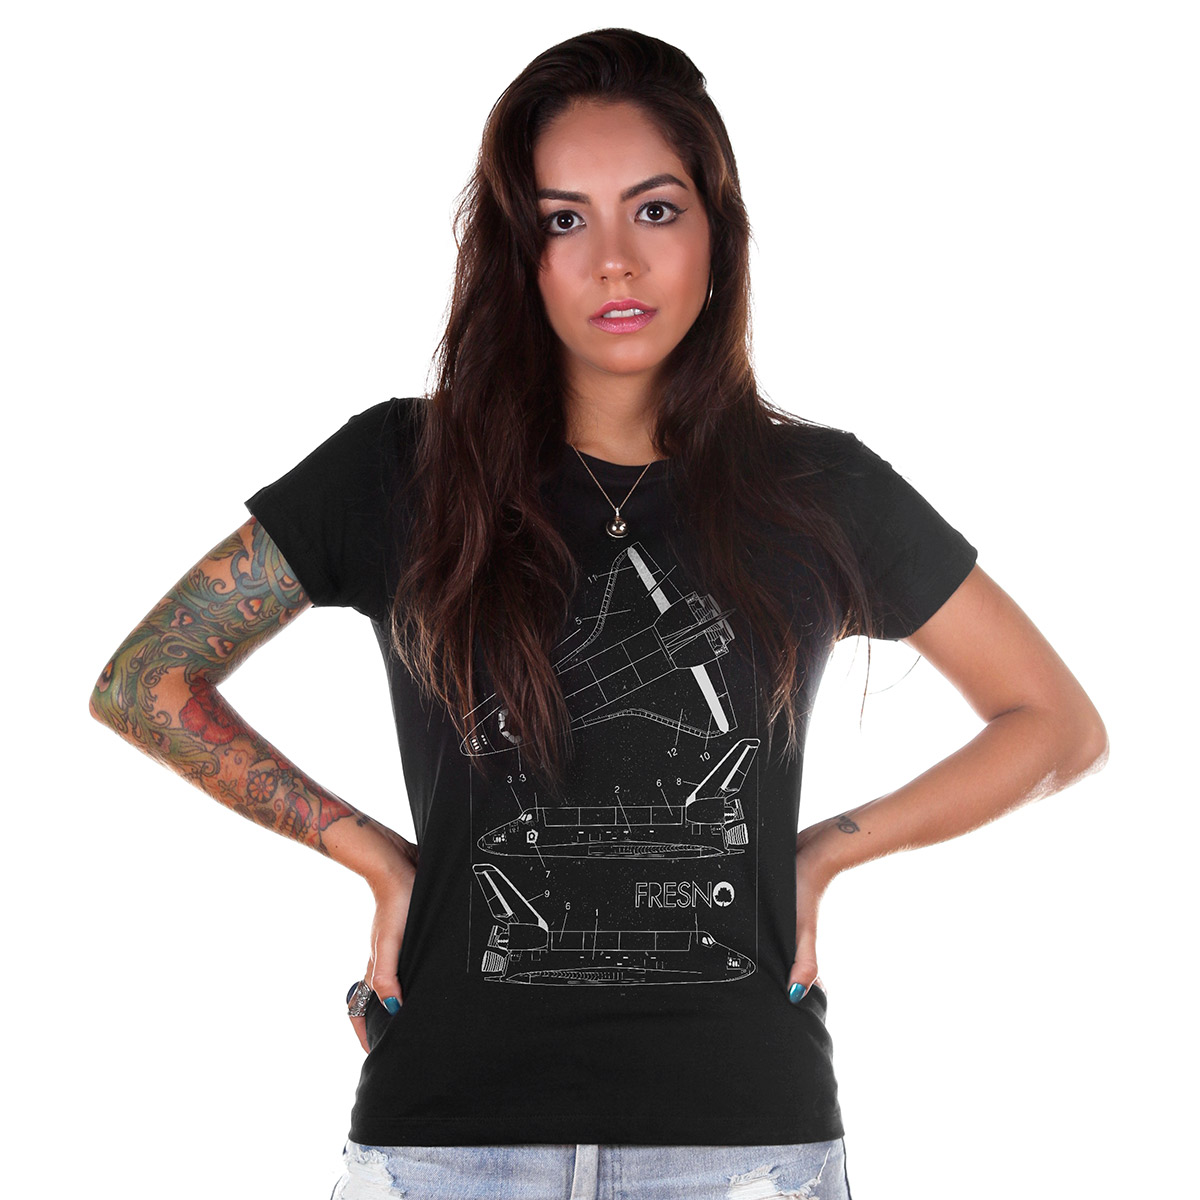 Camiseta Feminina Fresno Shuttles